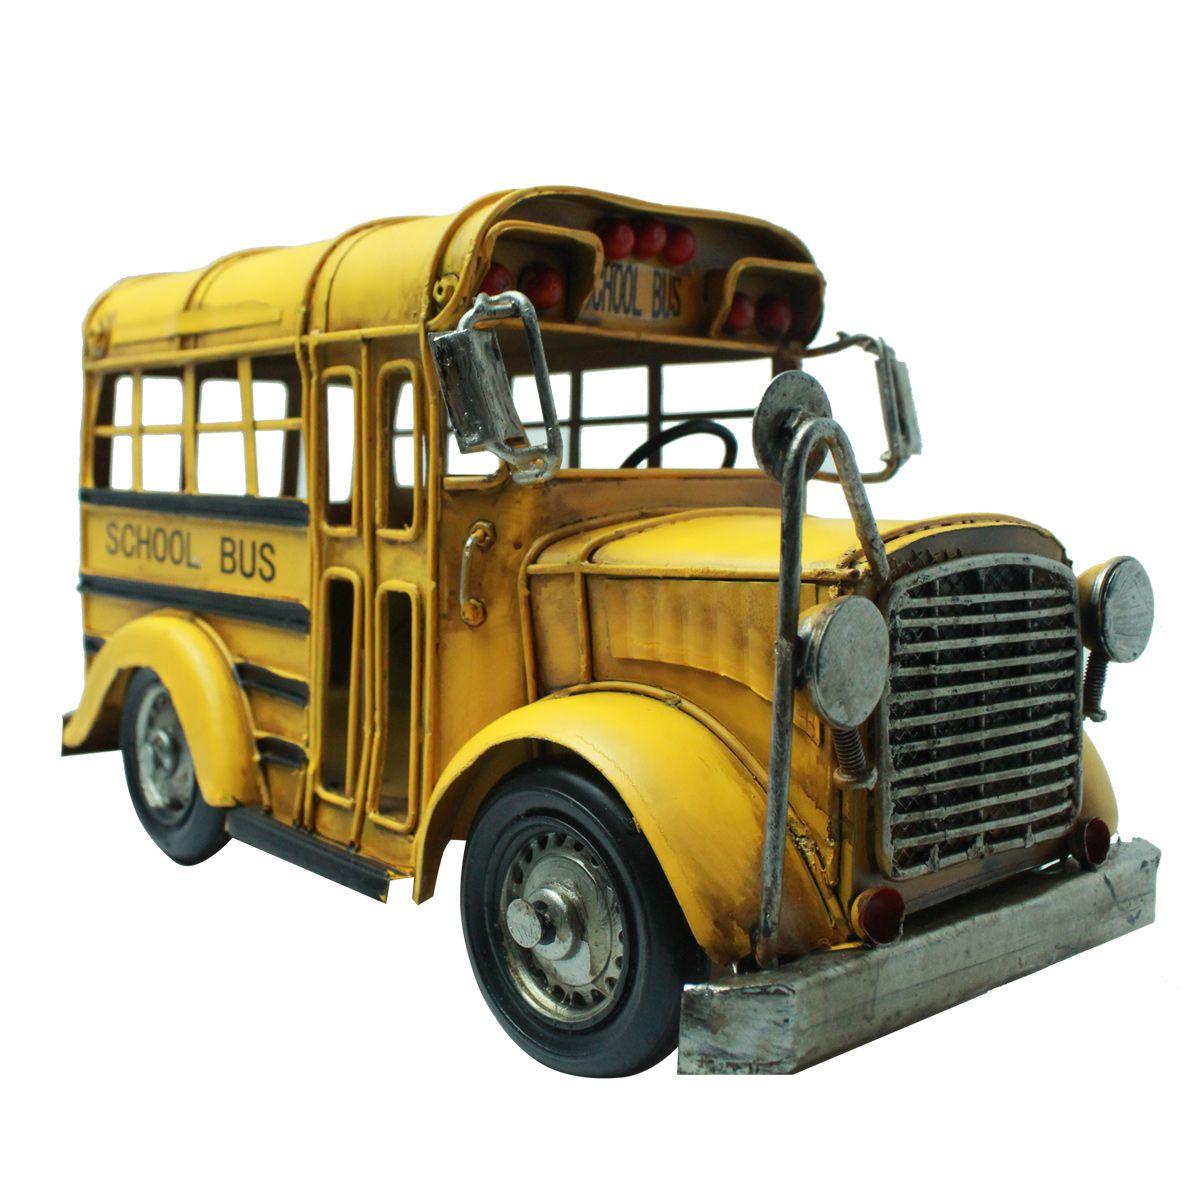 Ônibus Escolar Vintage Miniatura de Metal School Bus Retro